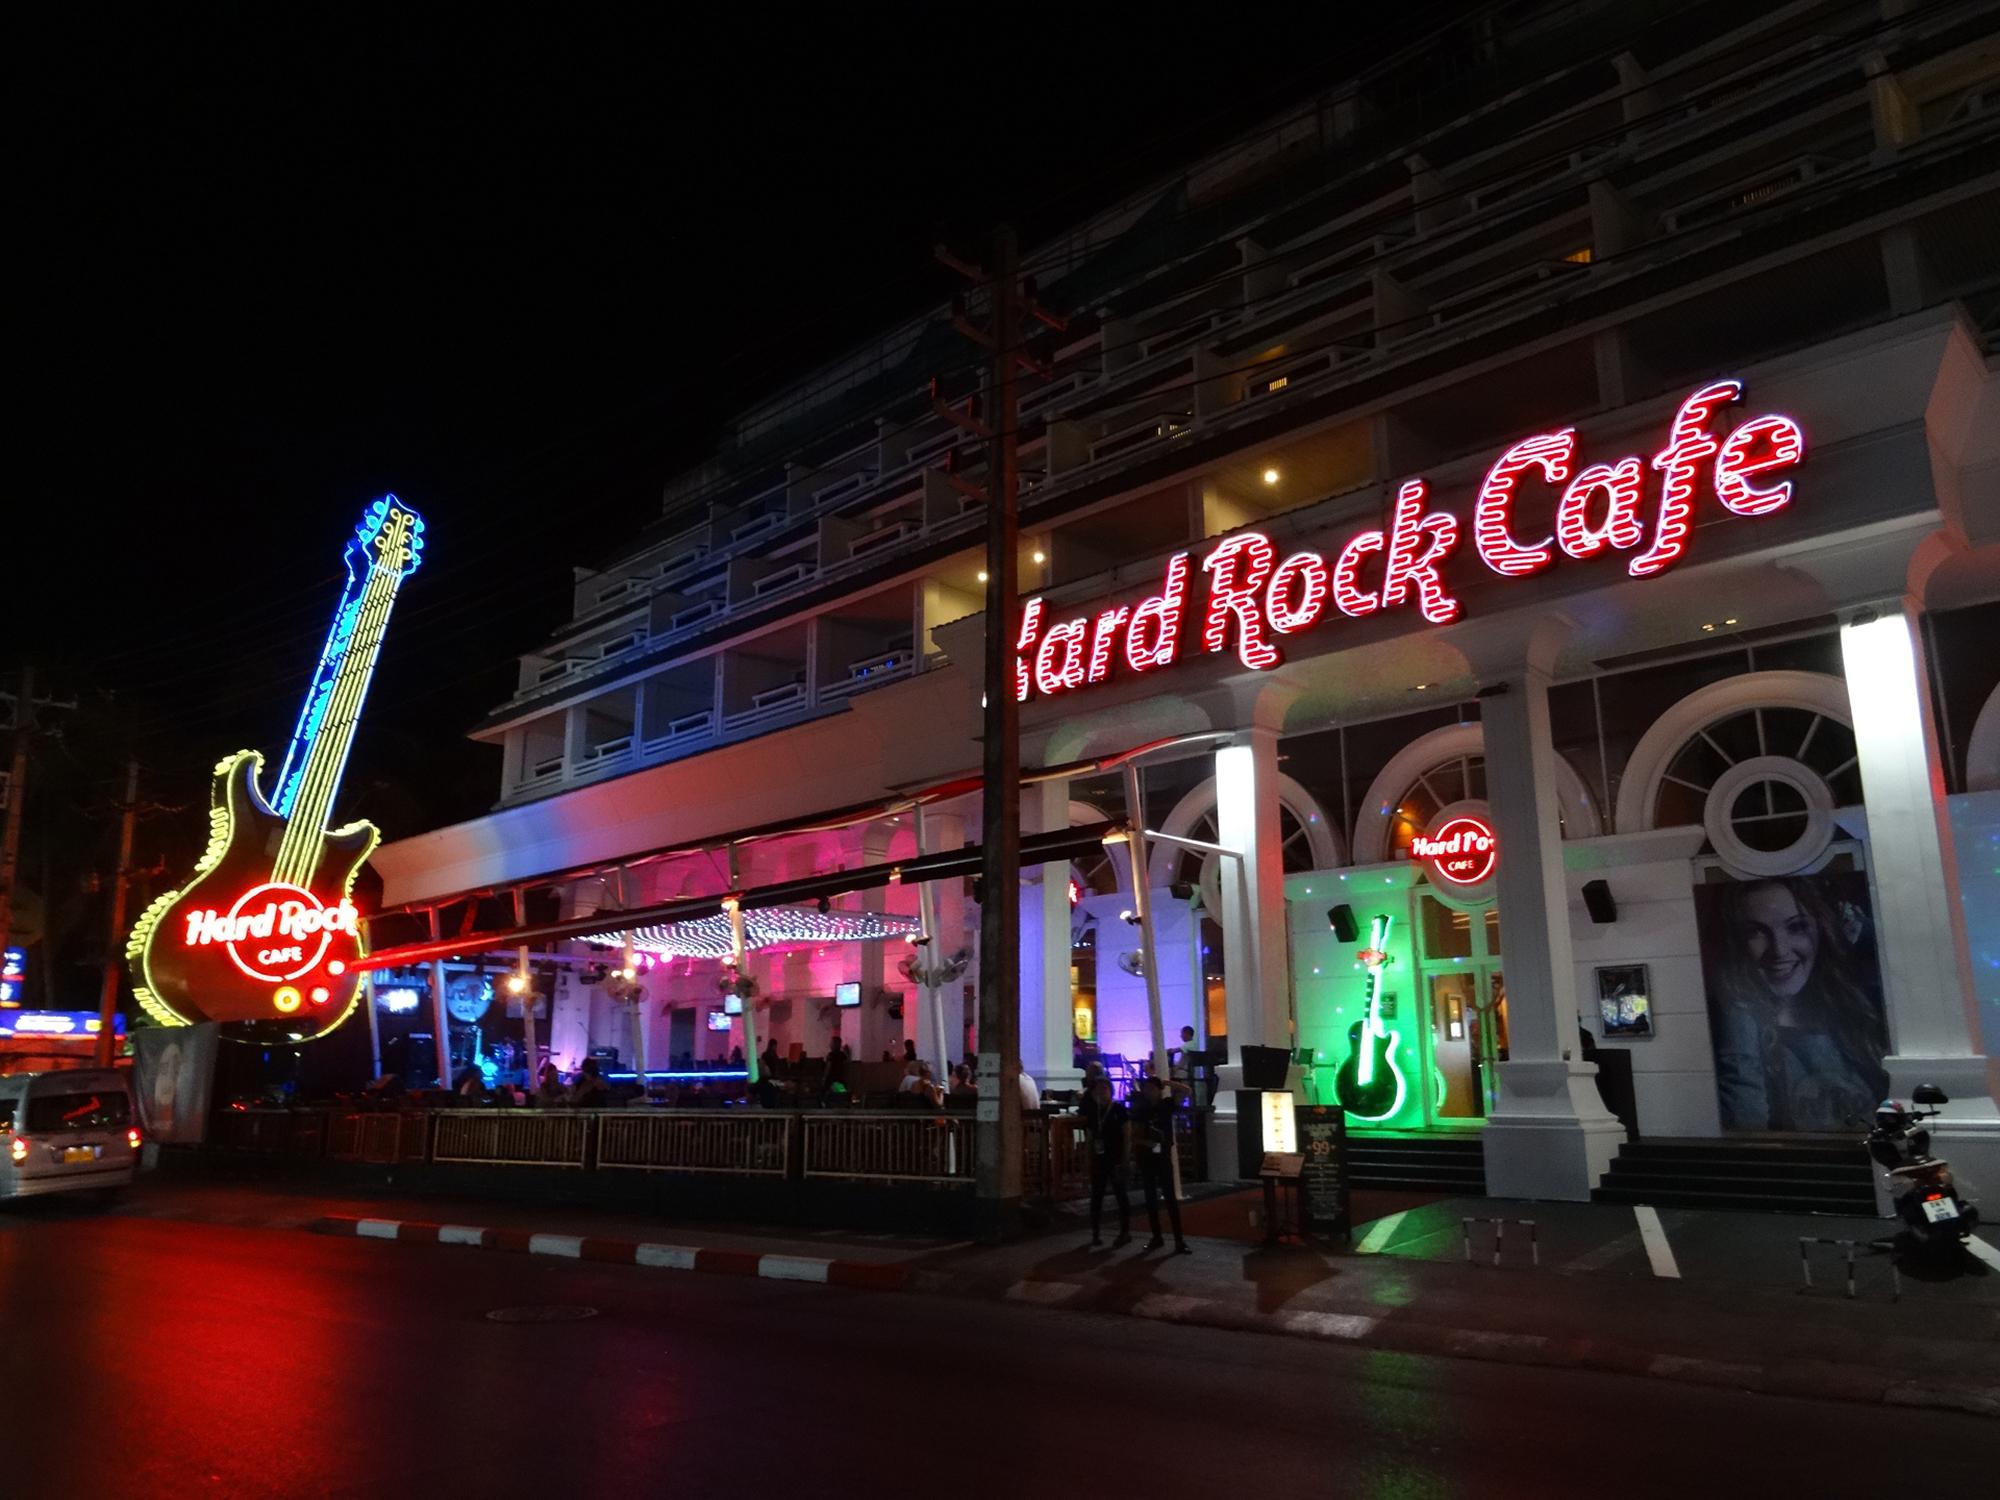 Hard Rock Cafe Phuket.JPG